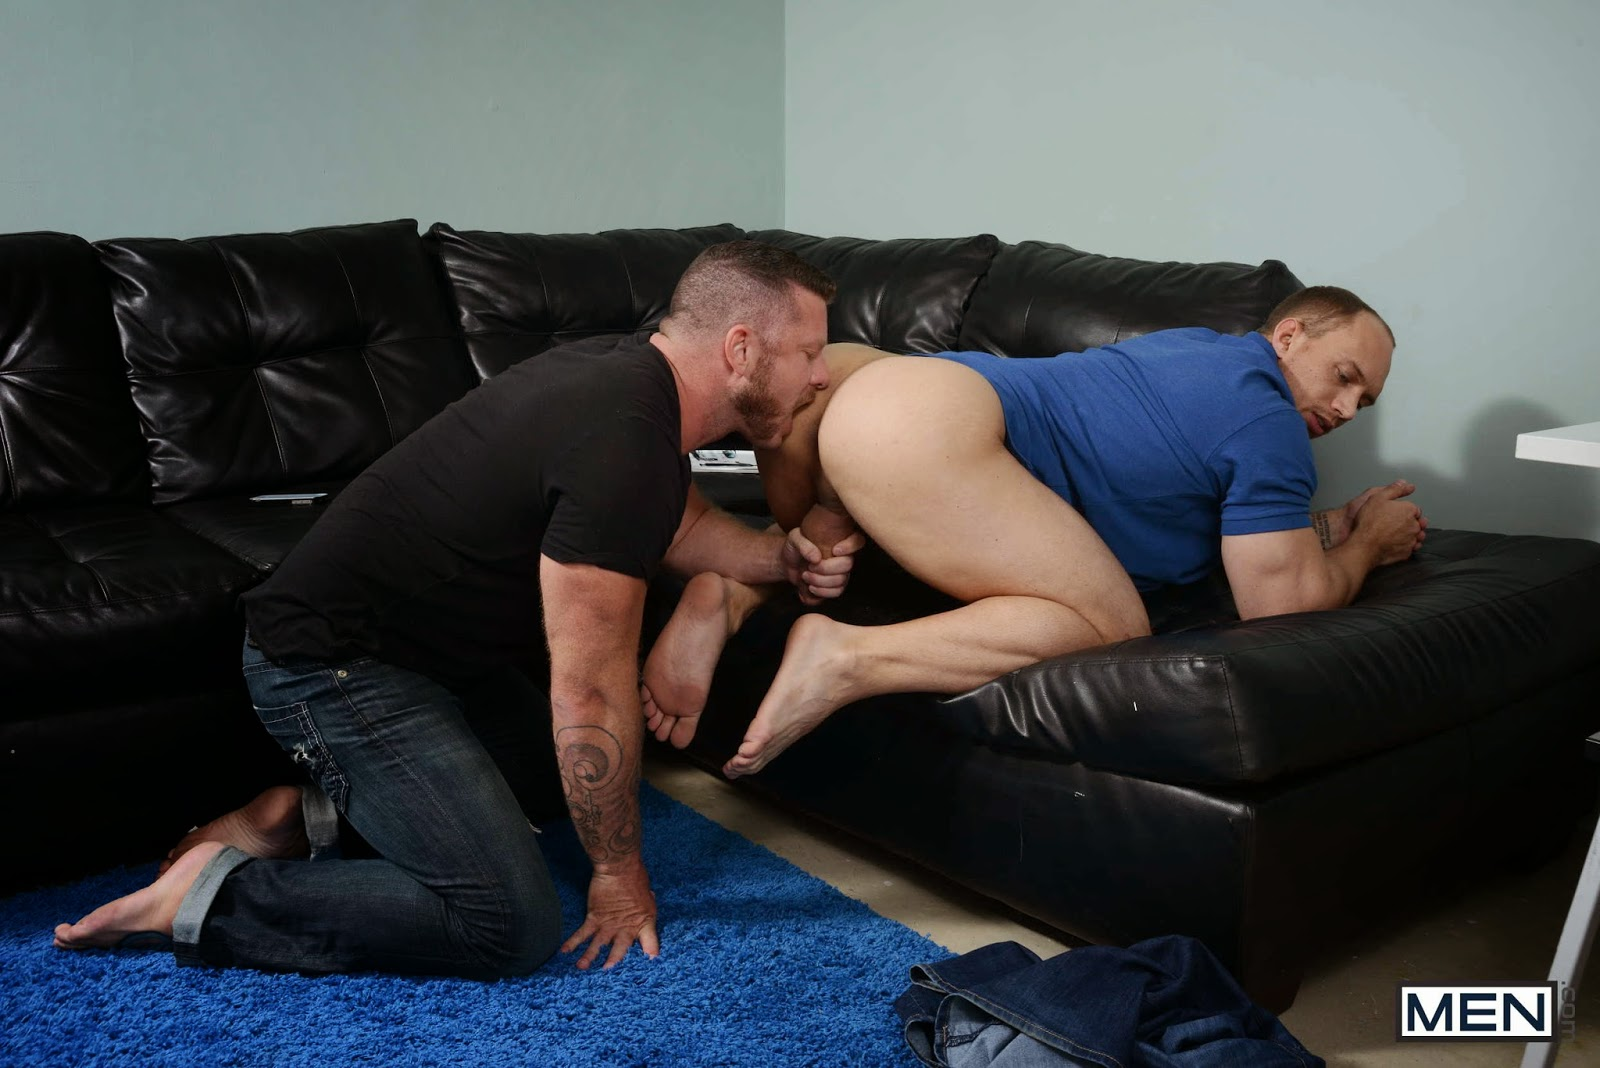 image Straight men eating mens sperm sites gay